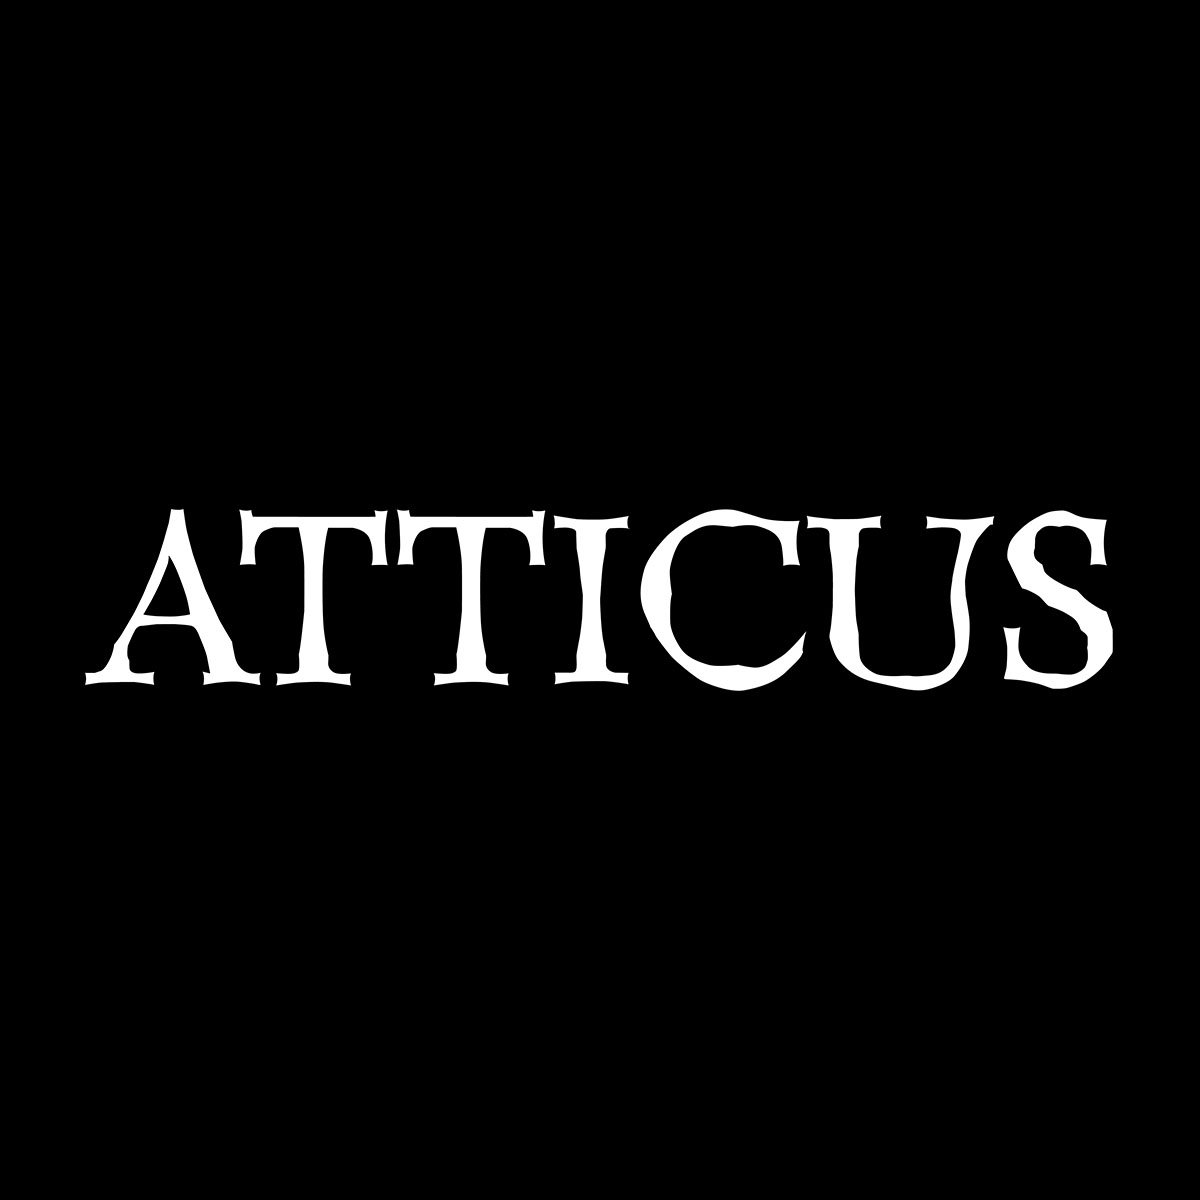 Atticus Word White Men's Hoode...